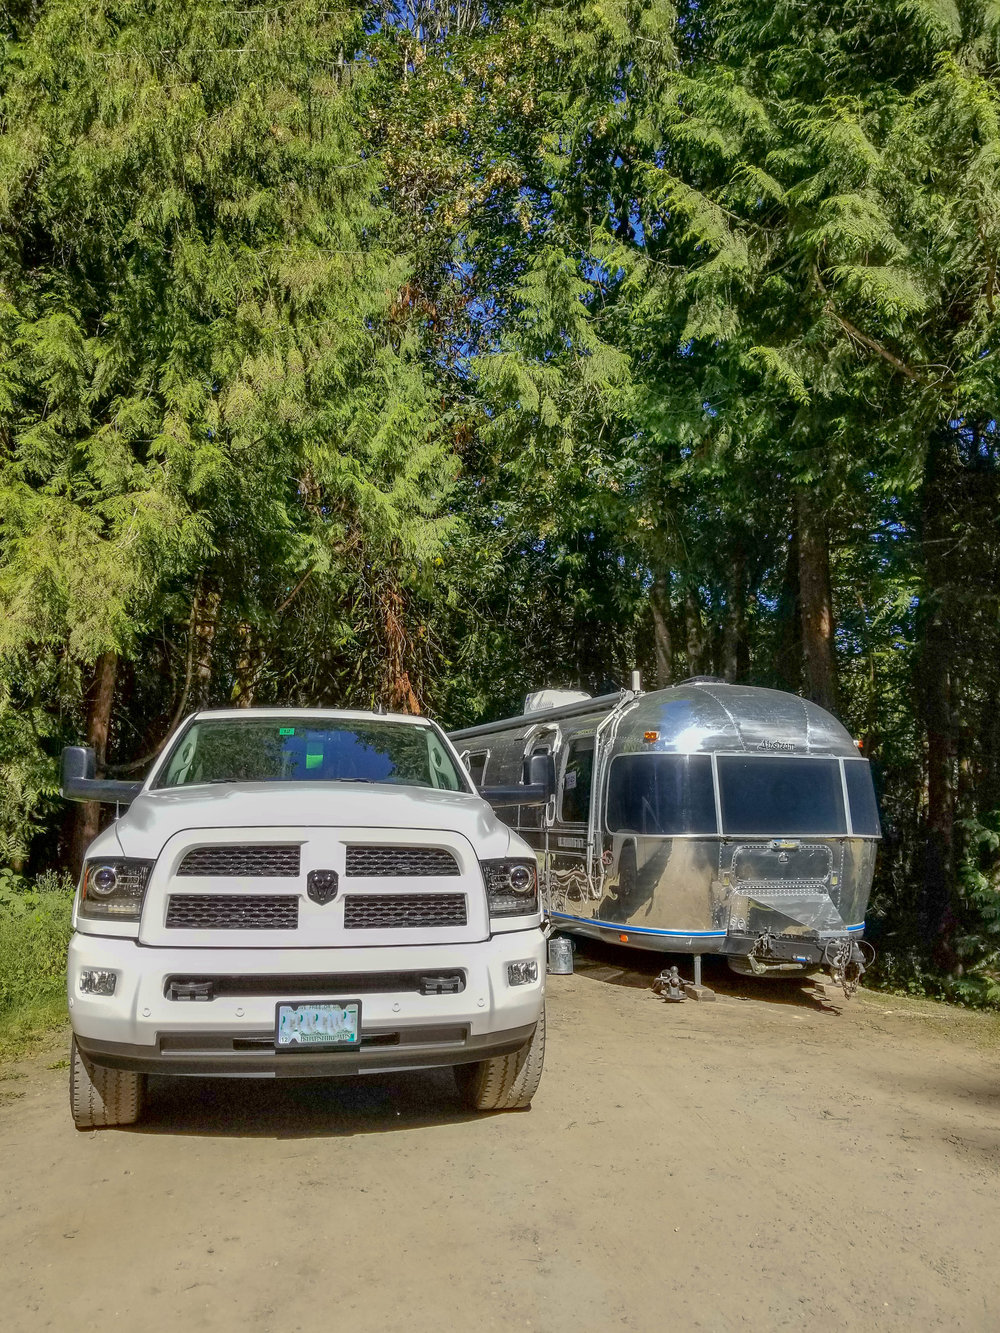 Tall Chief RV & Camping Resort    Fall City, WA